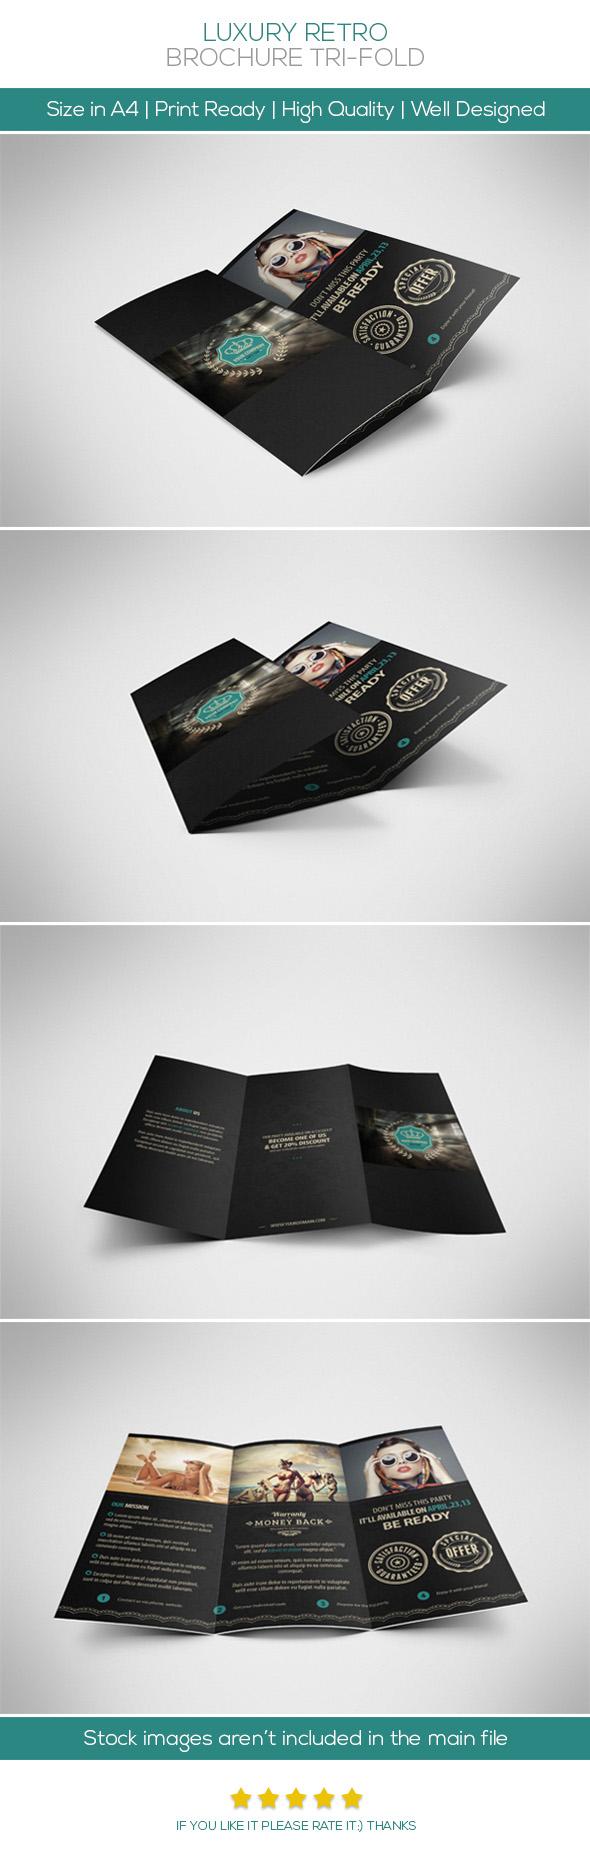 Retro Luxury Brochure Tri-fold